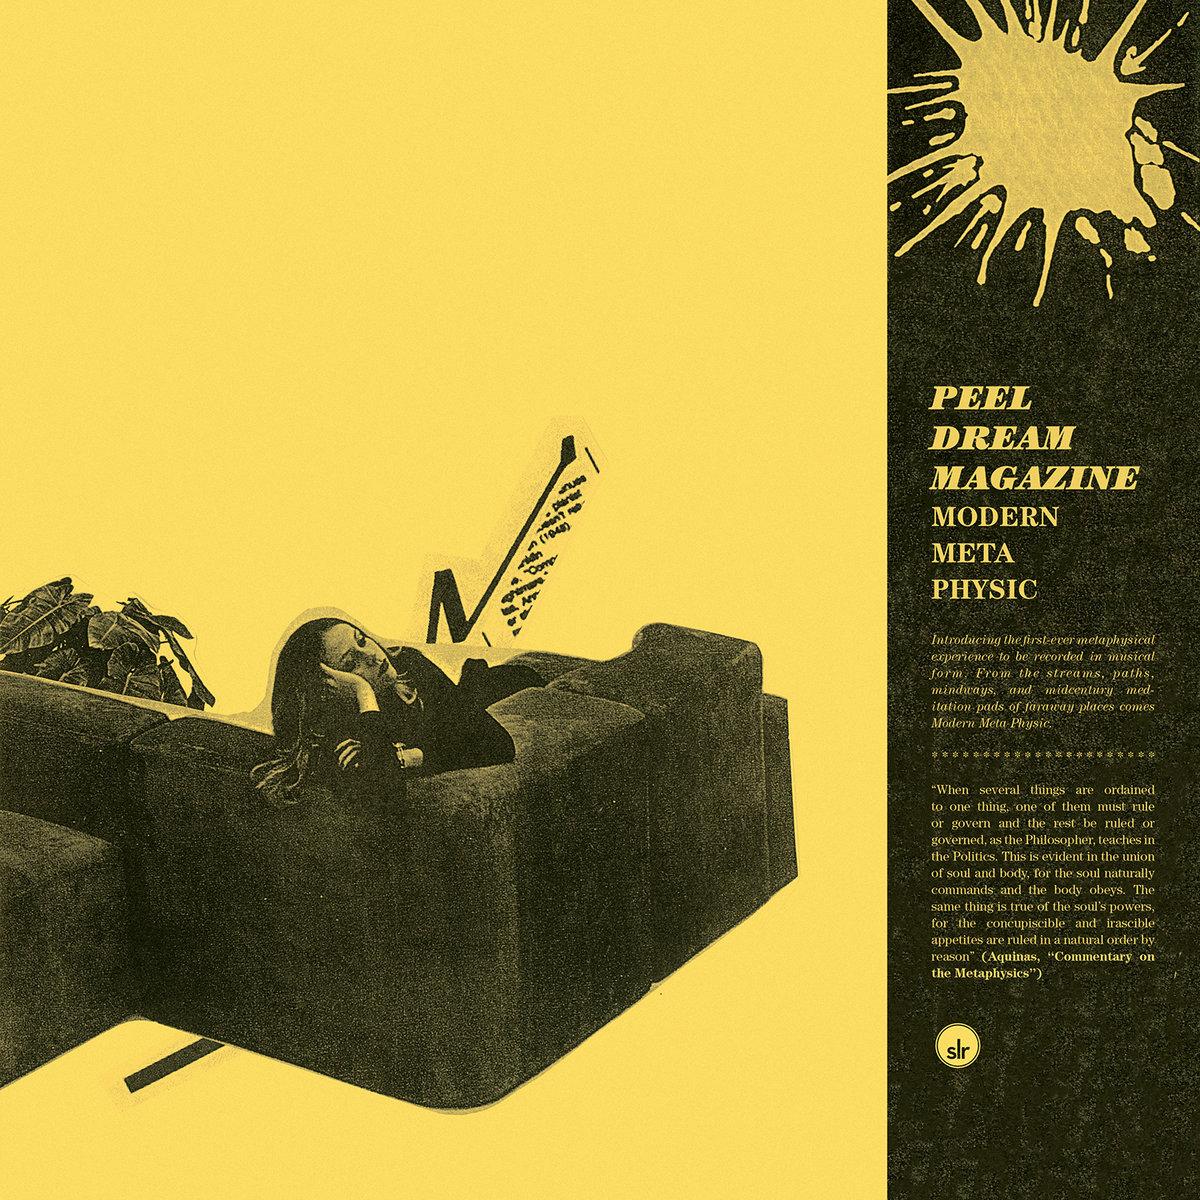 Peel Dream Magazine - Modern Meta Physics [LP]